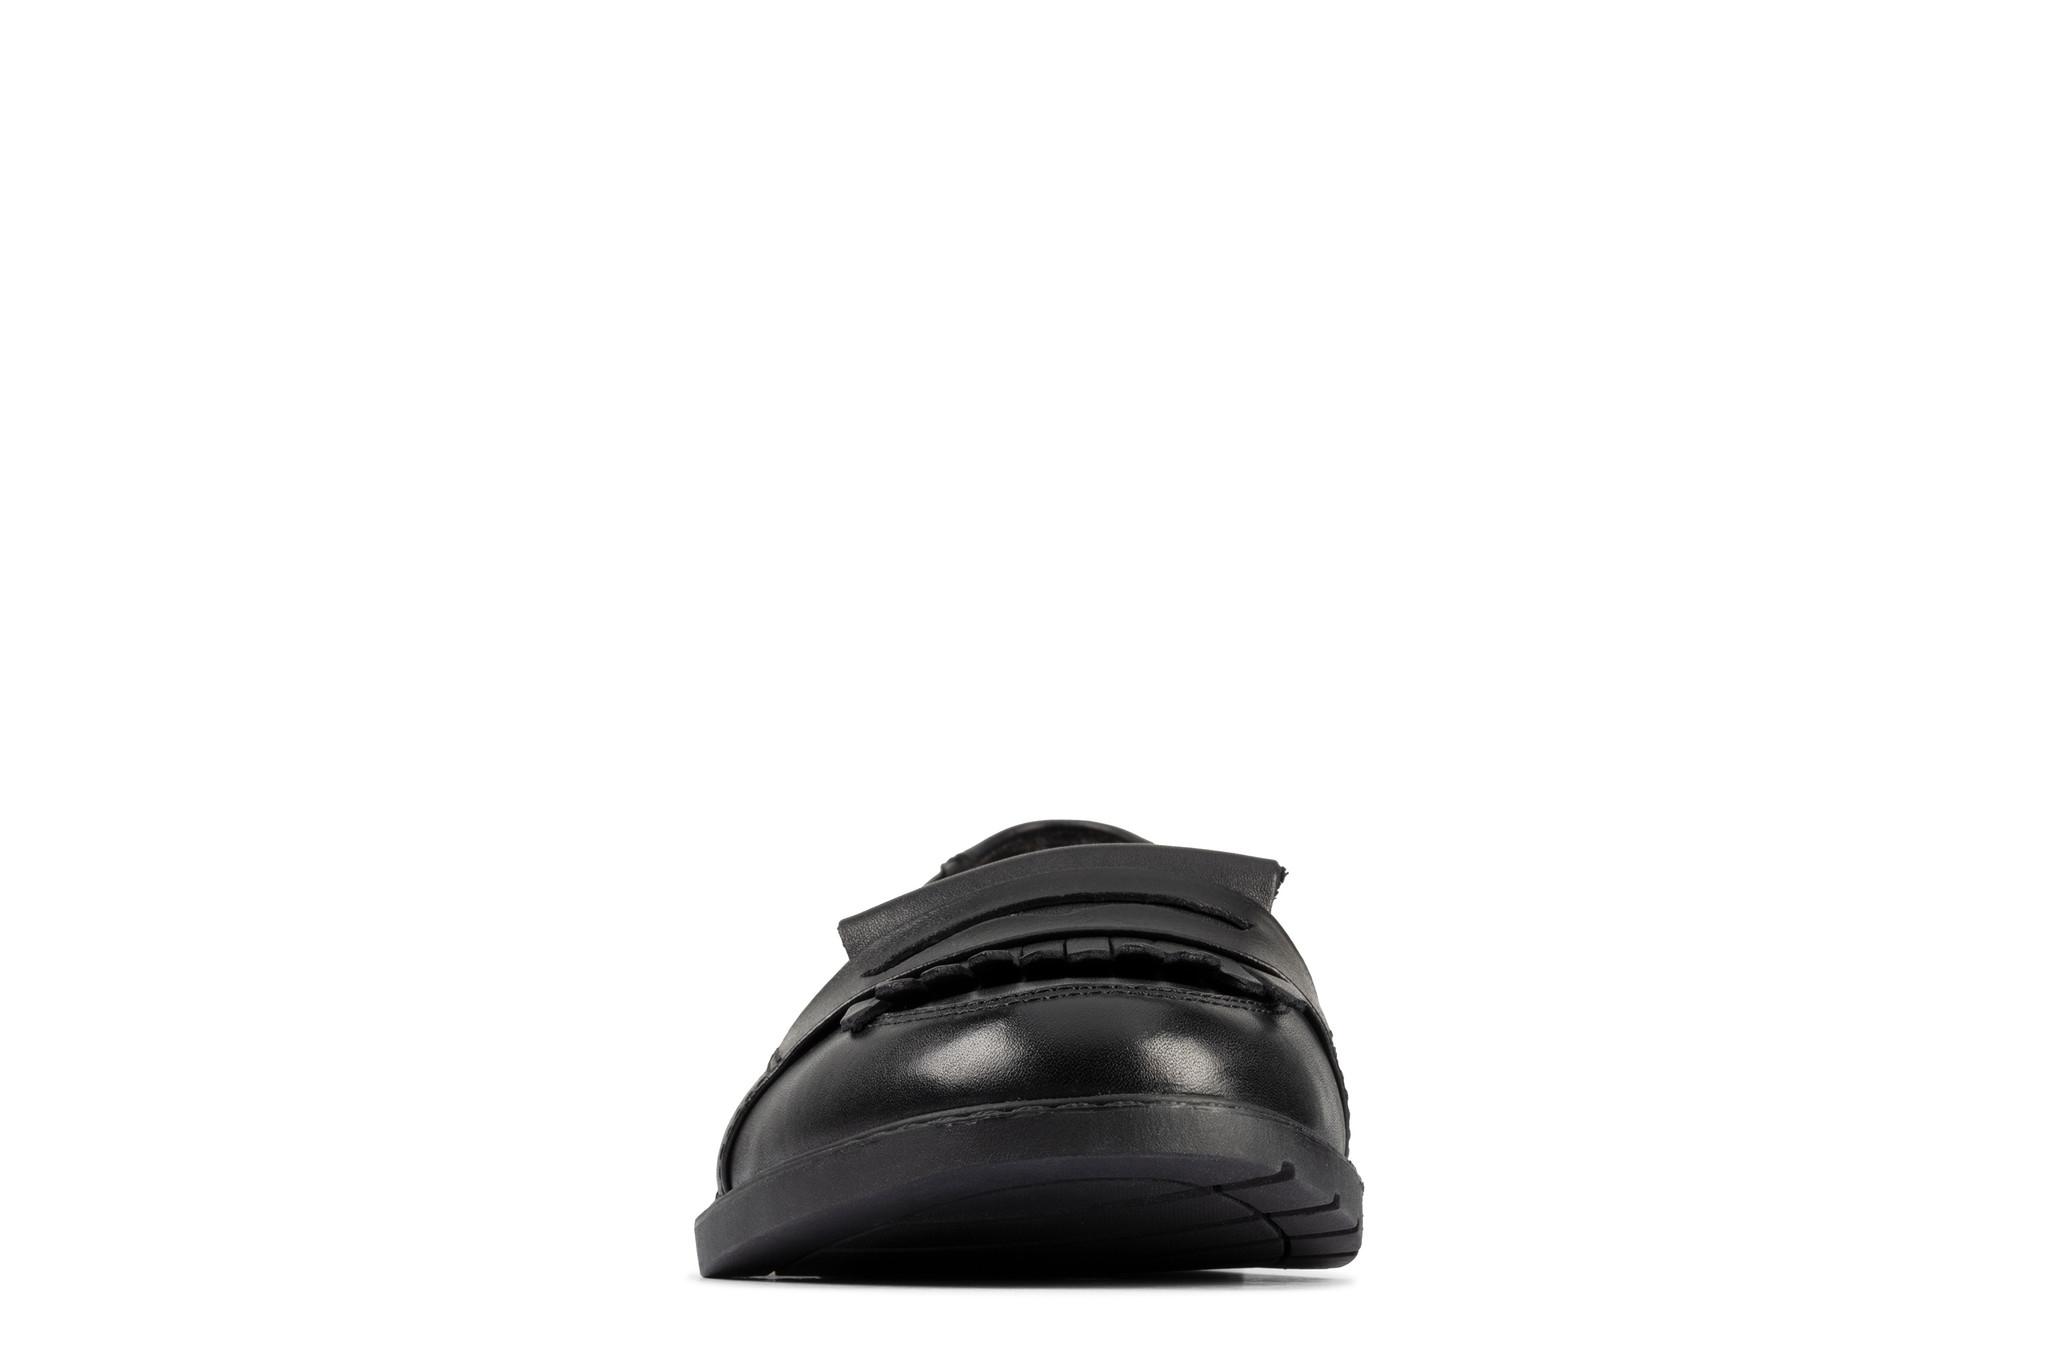 Clarks Scala Bright Black Leather 6